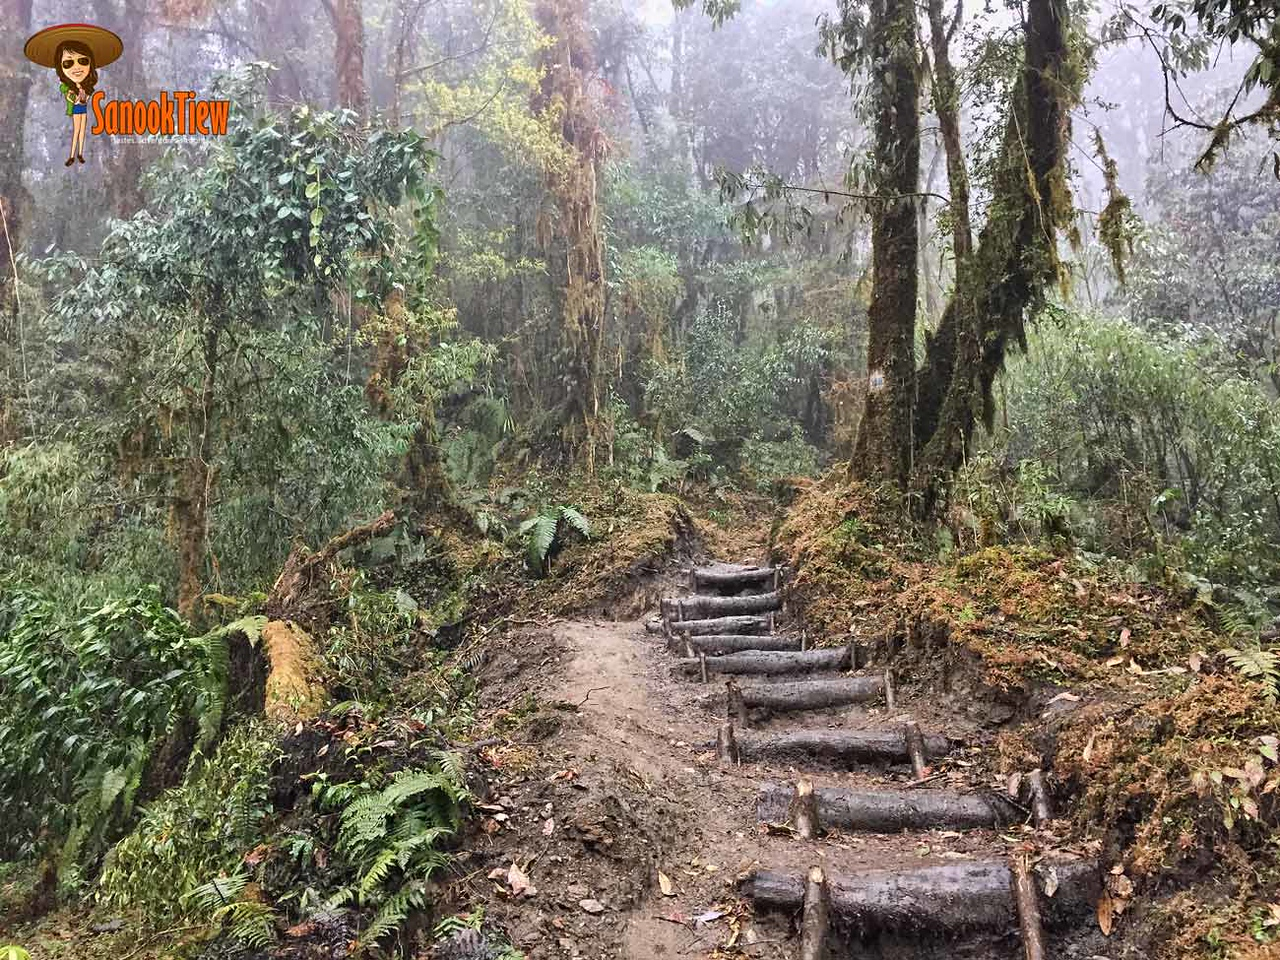 Mardi Himal trekking Nepal เทรคกิ้ง มาดิฮิมาล เนปาล